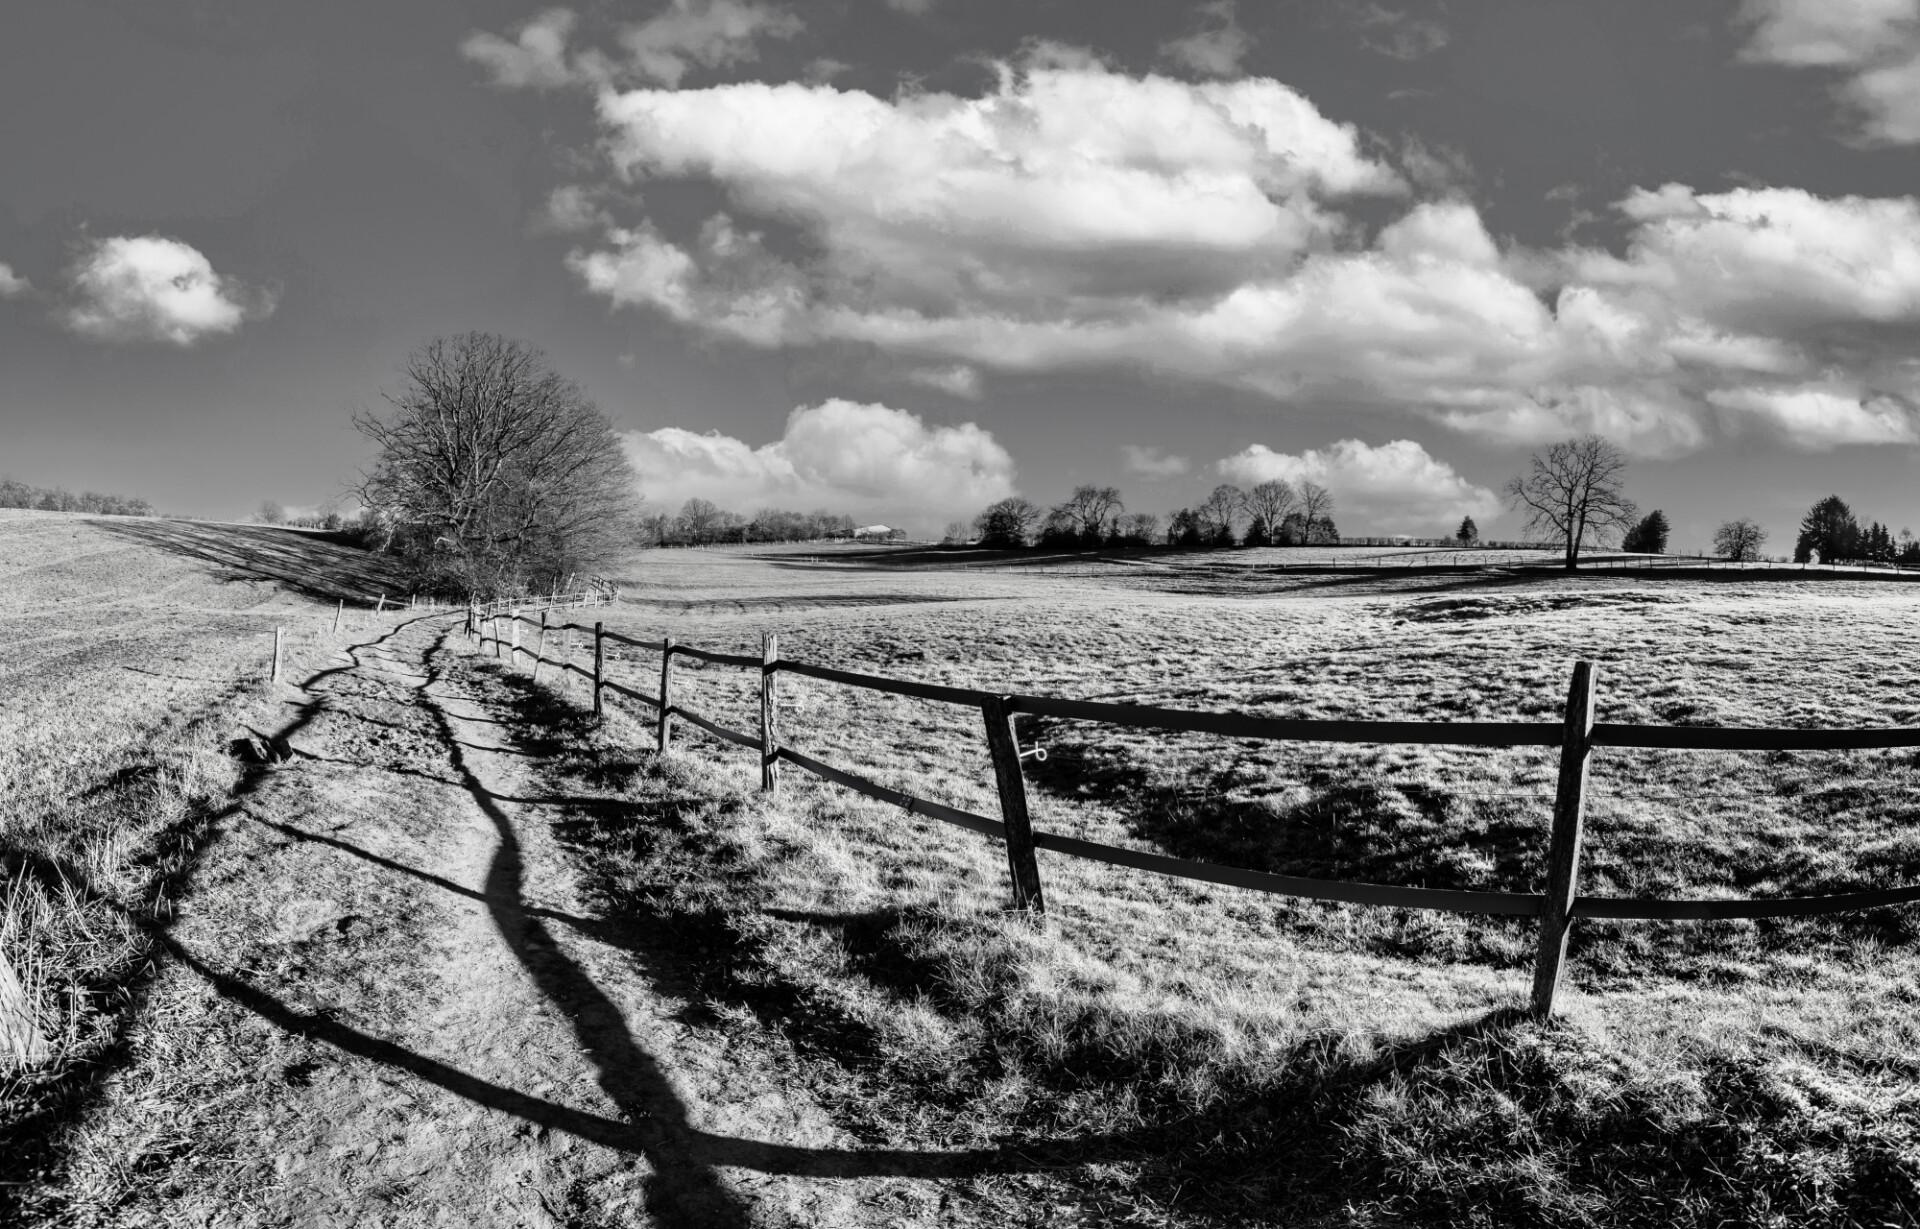 Rural landscape in blacknwhite